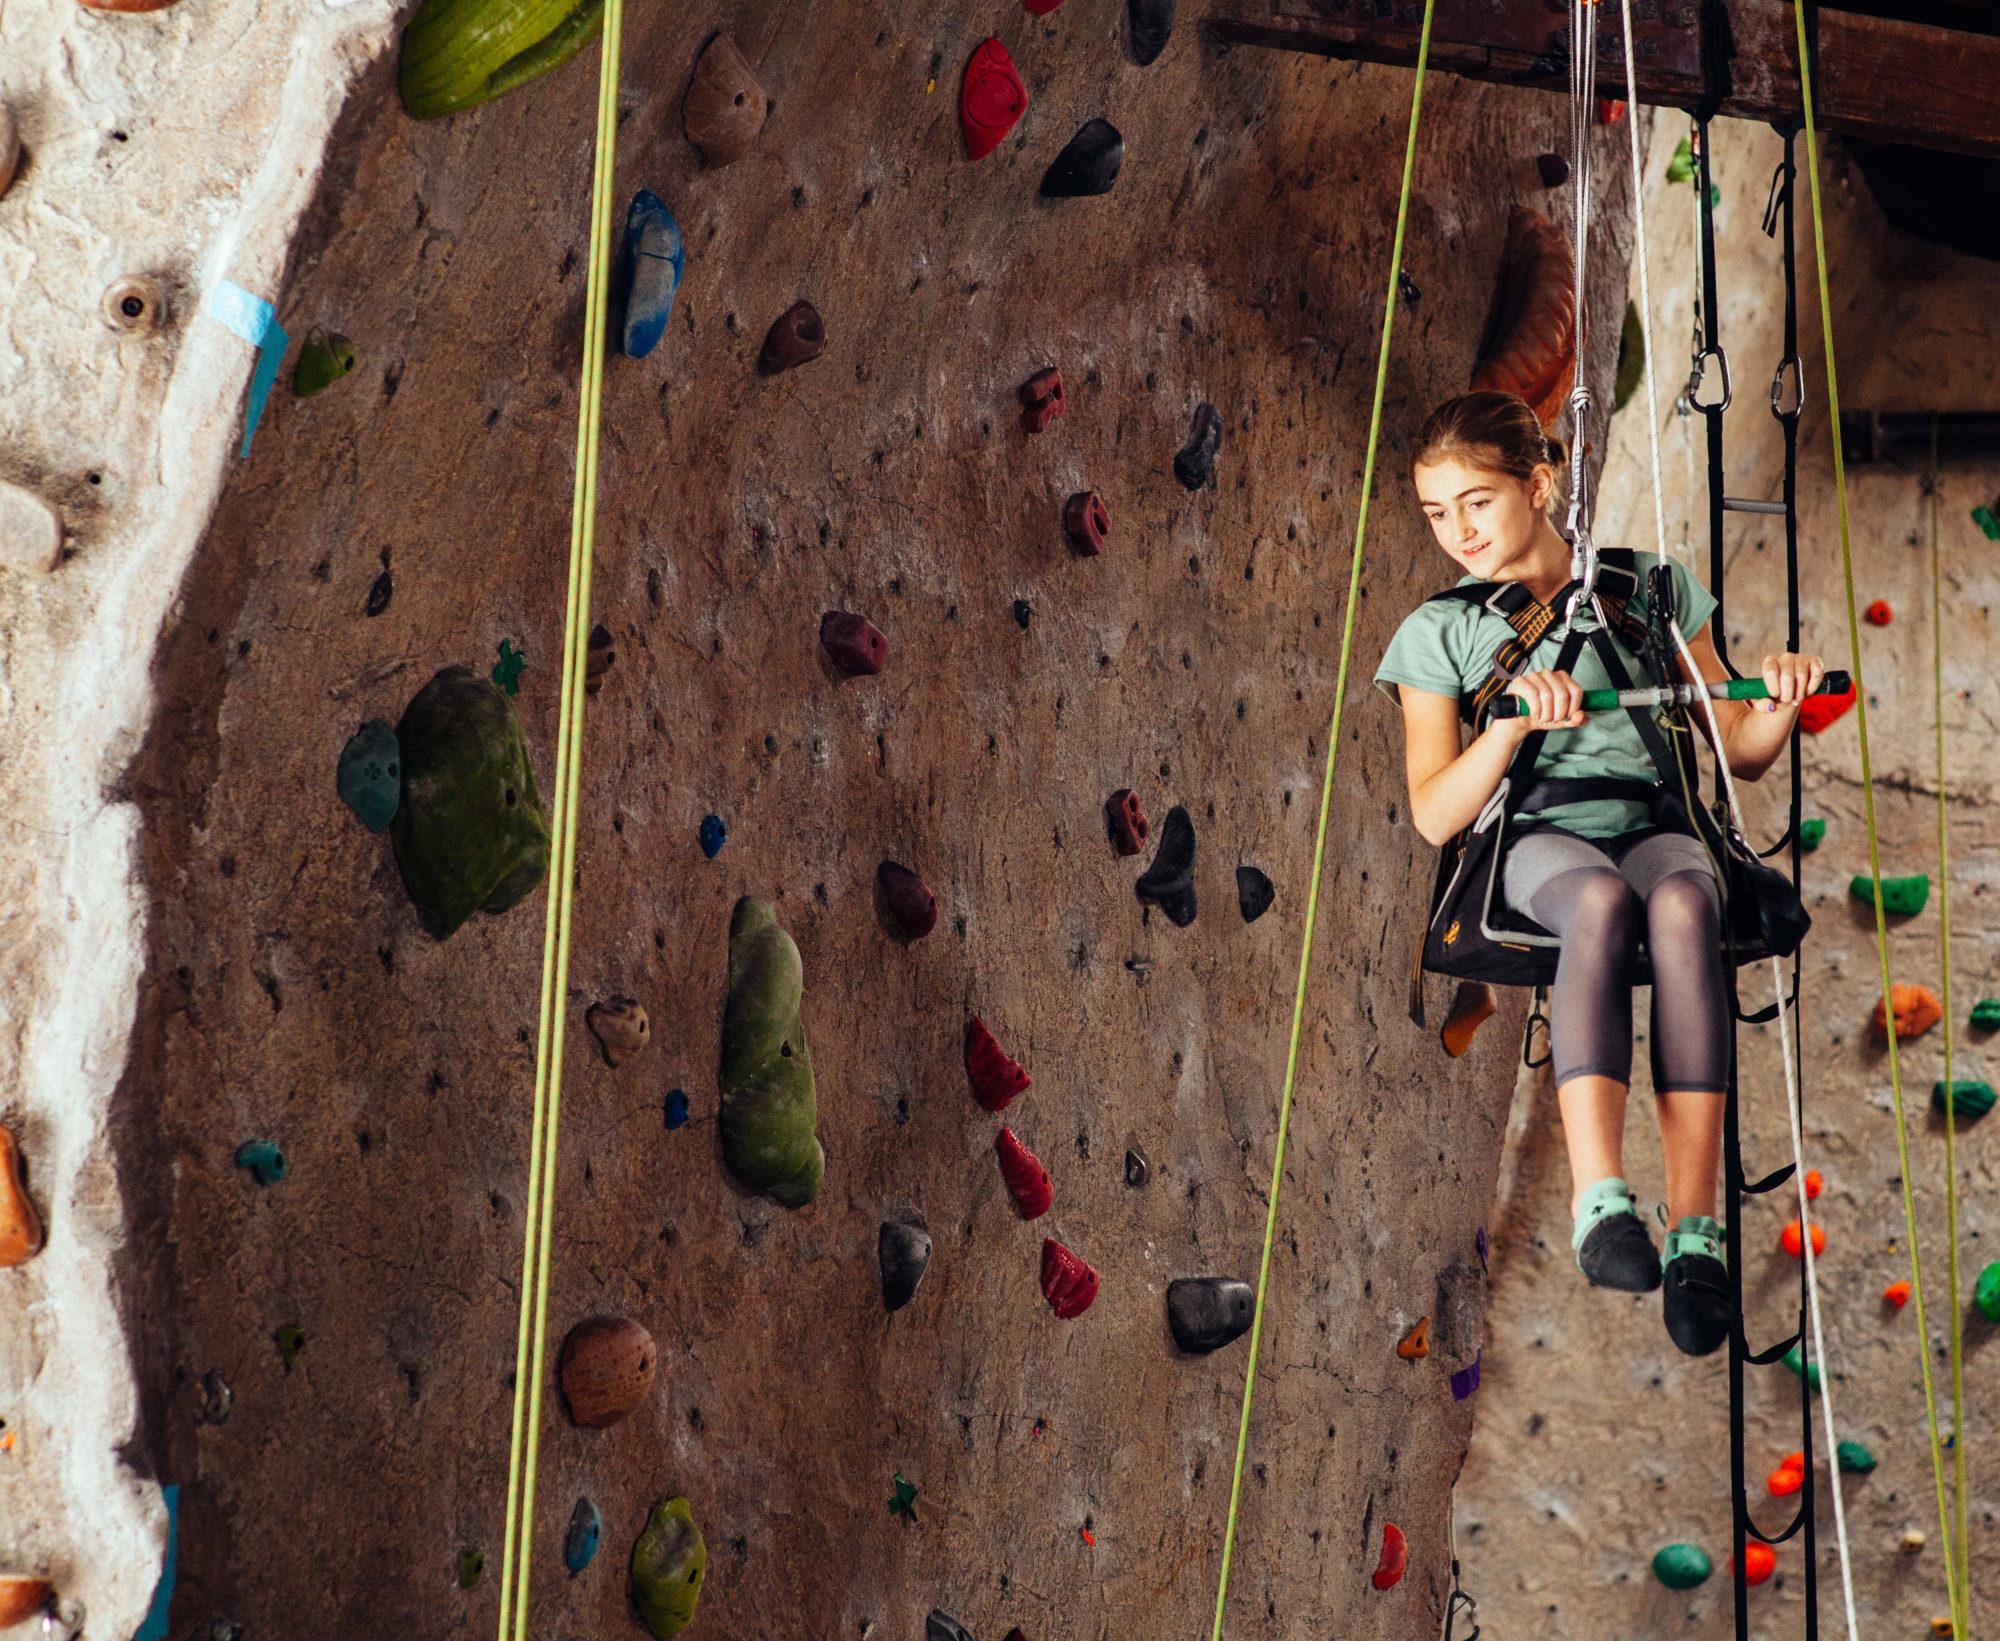 Climber Climbing at ACI Course at Sanctuary Rock Gym in CA